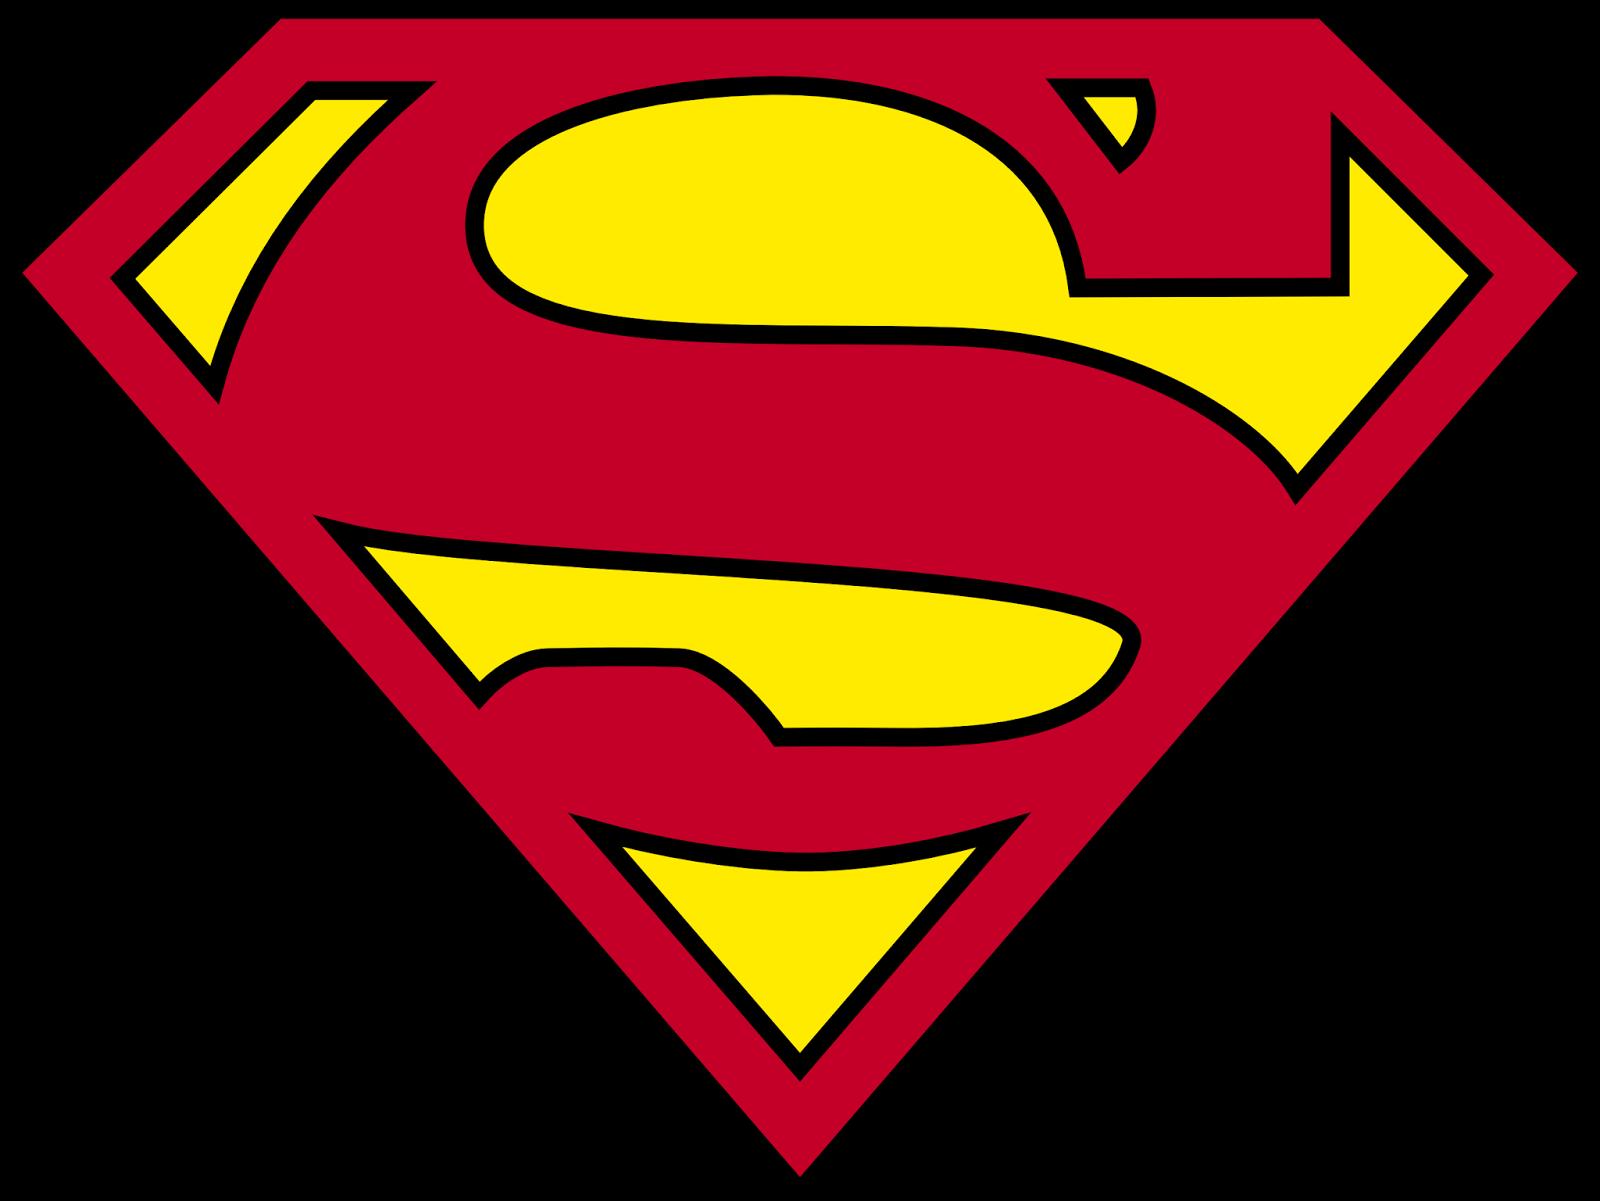 http://intothecomicverse.blogspot.com.br/2015/04/superman-mini-guia-de-leitura-parte-2.html